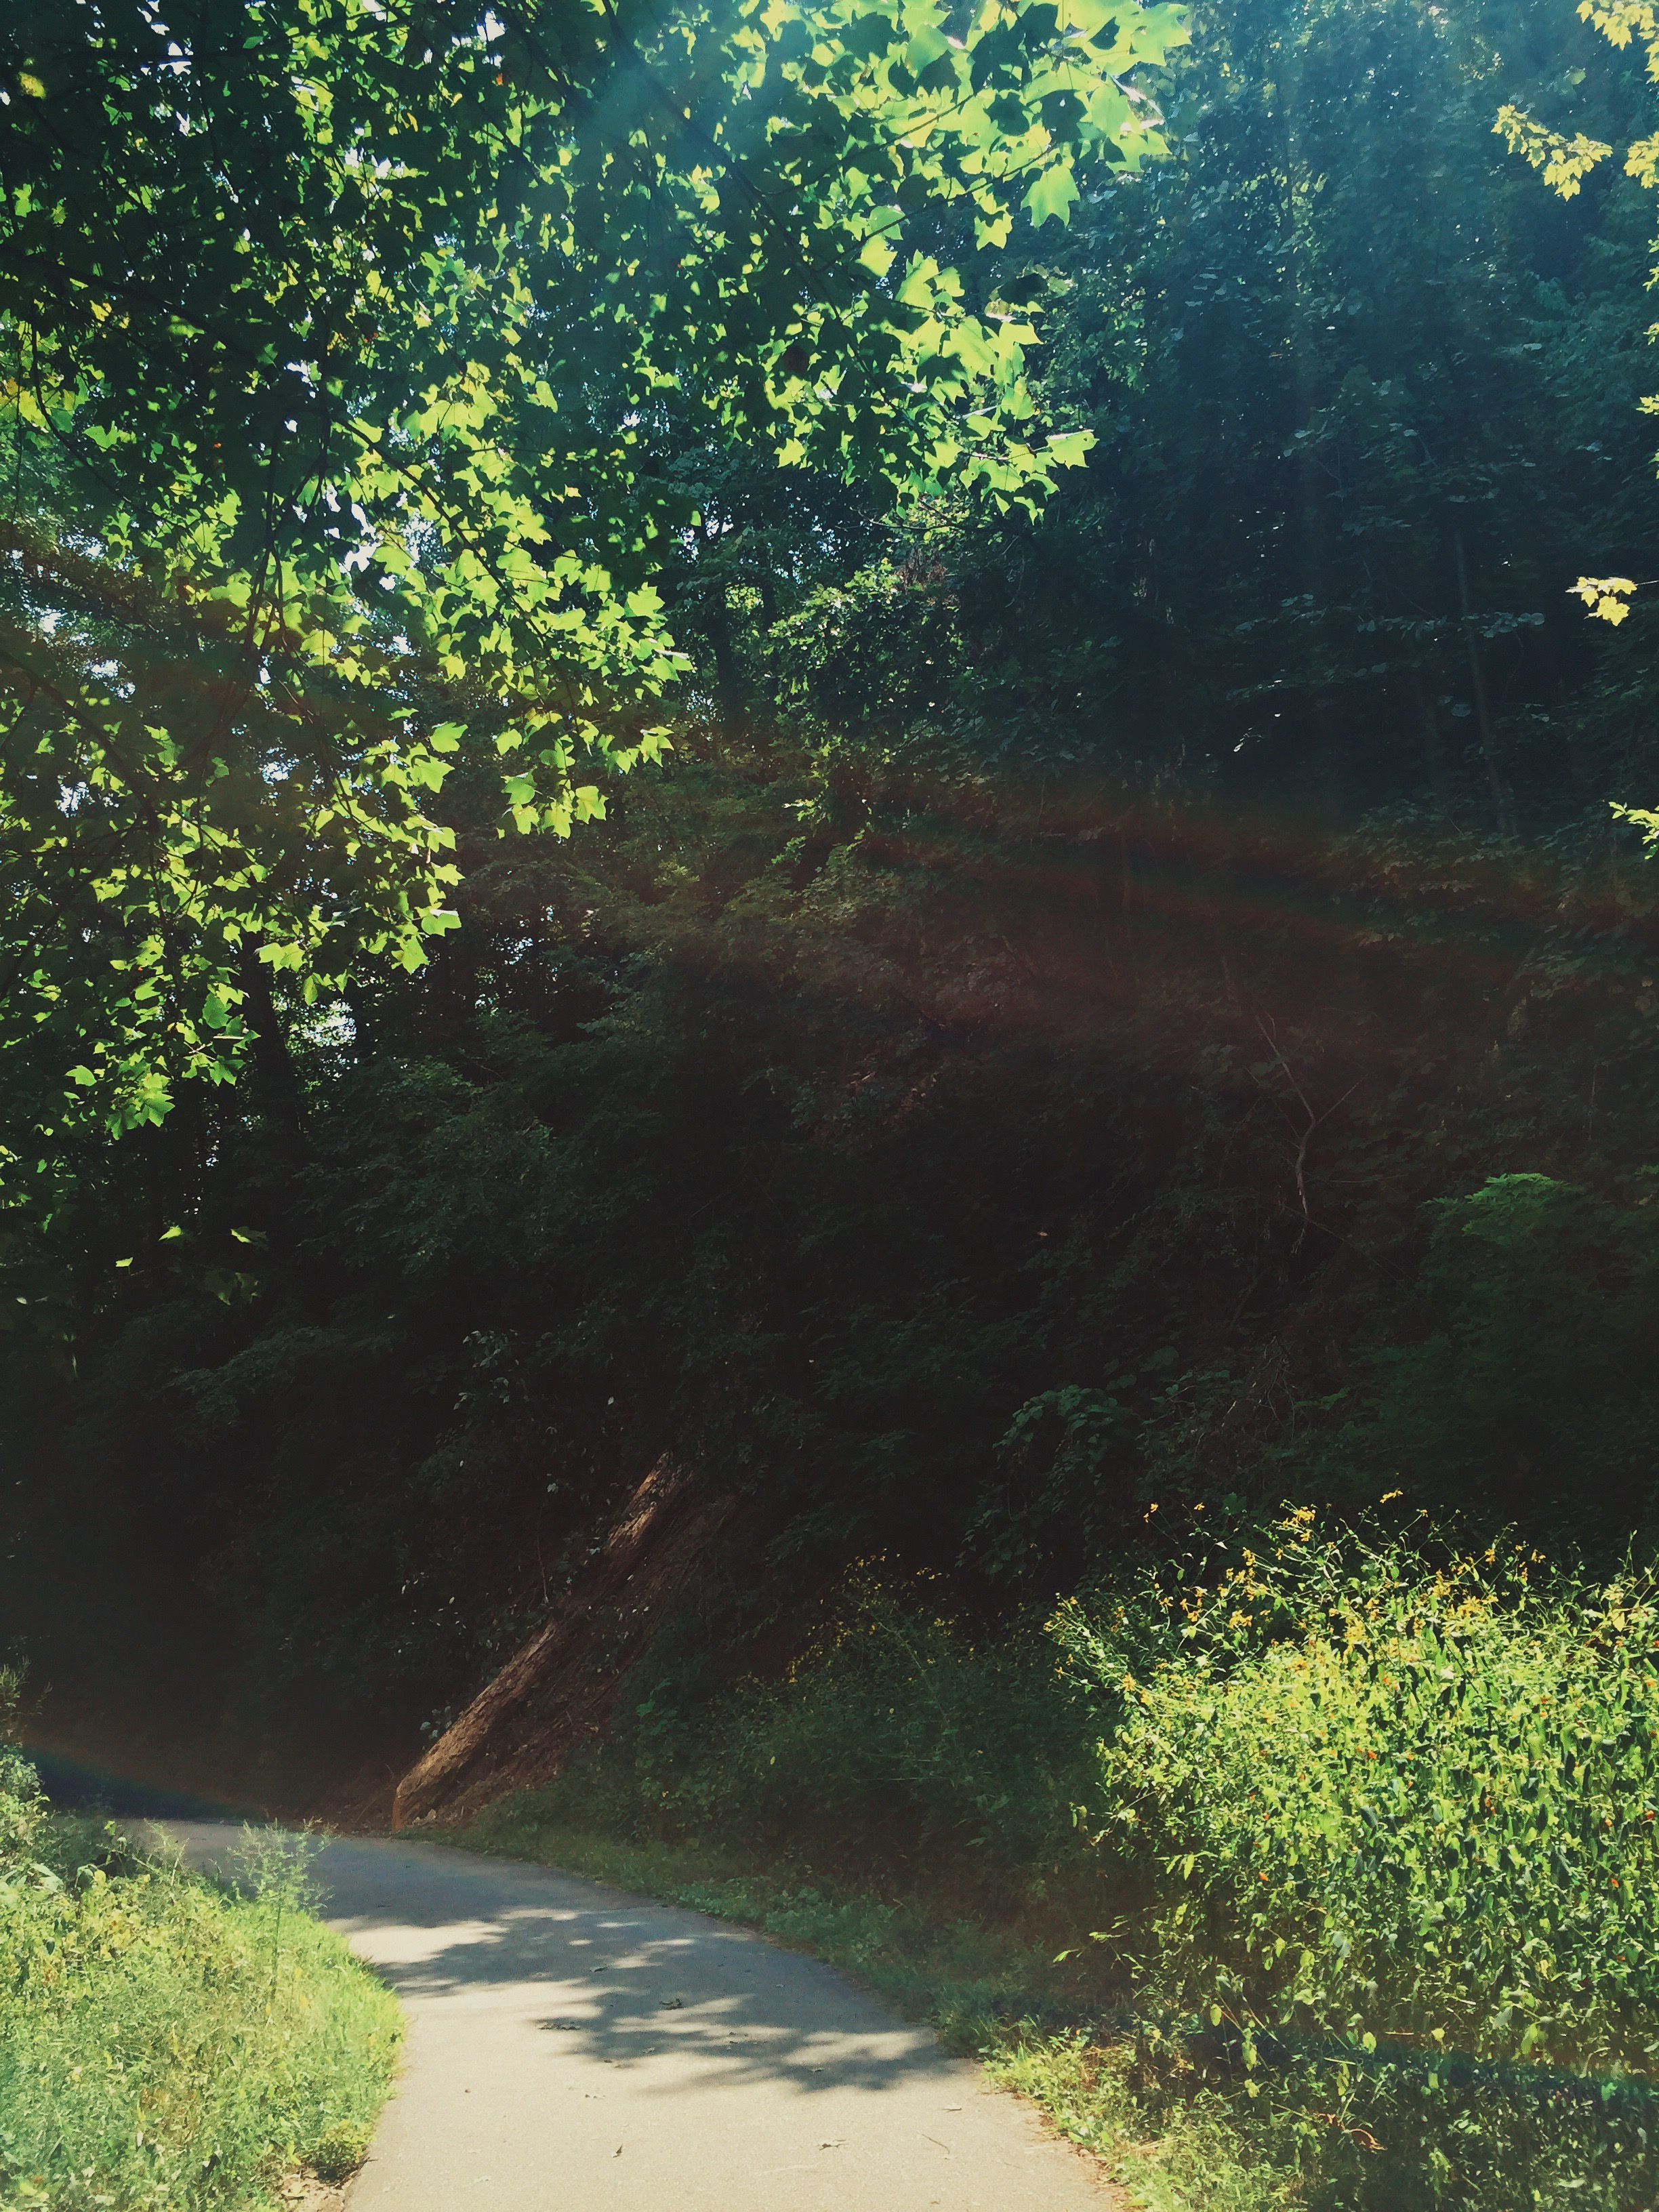 Photo Sep 04, 2 35 34 PM.jpg